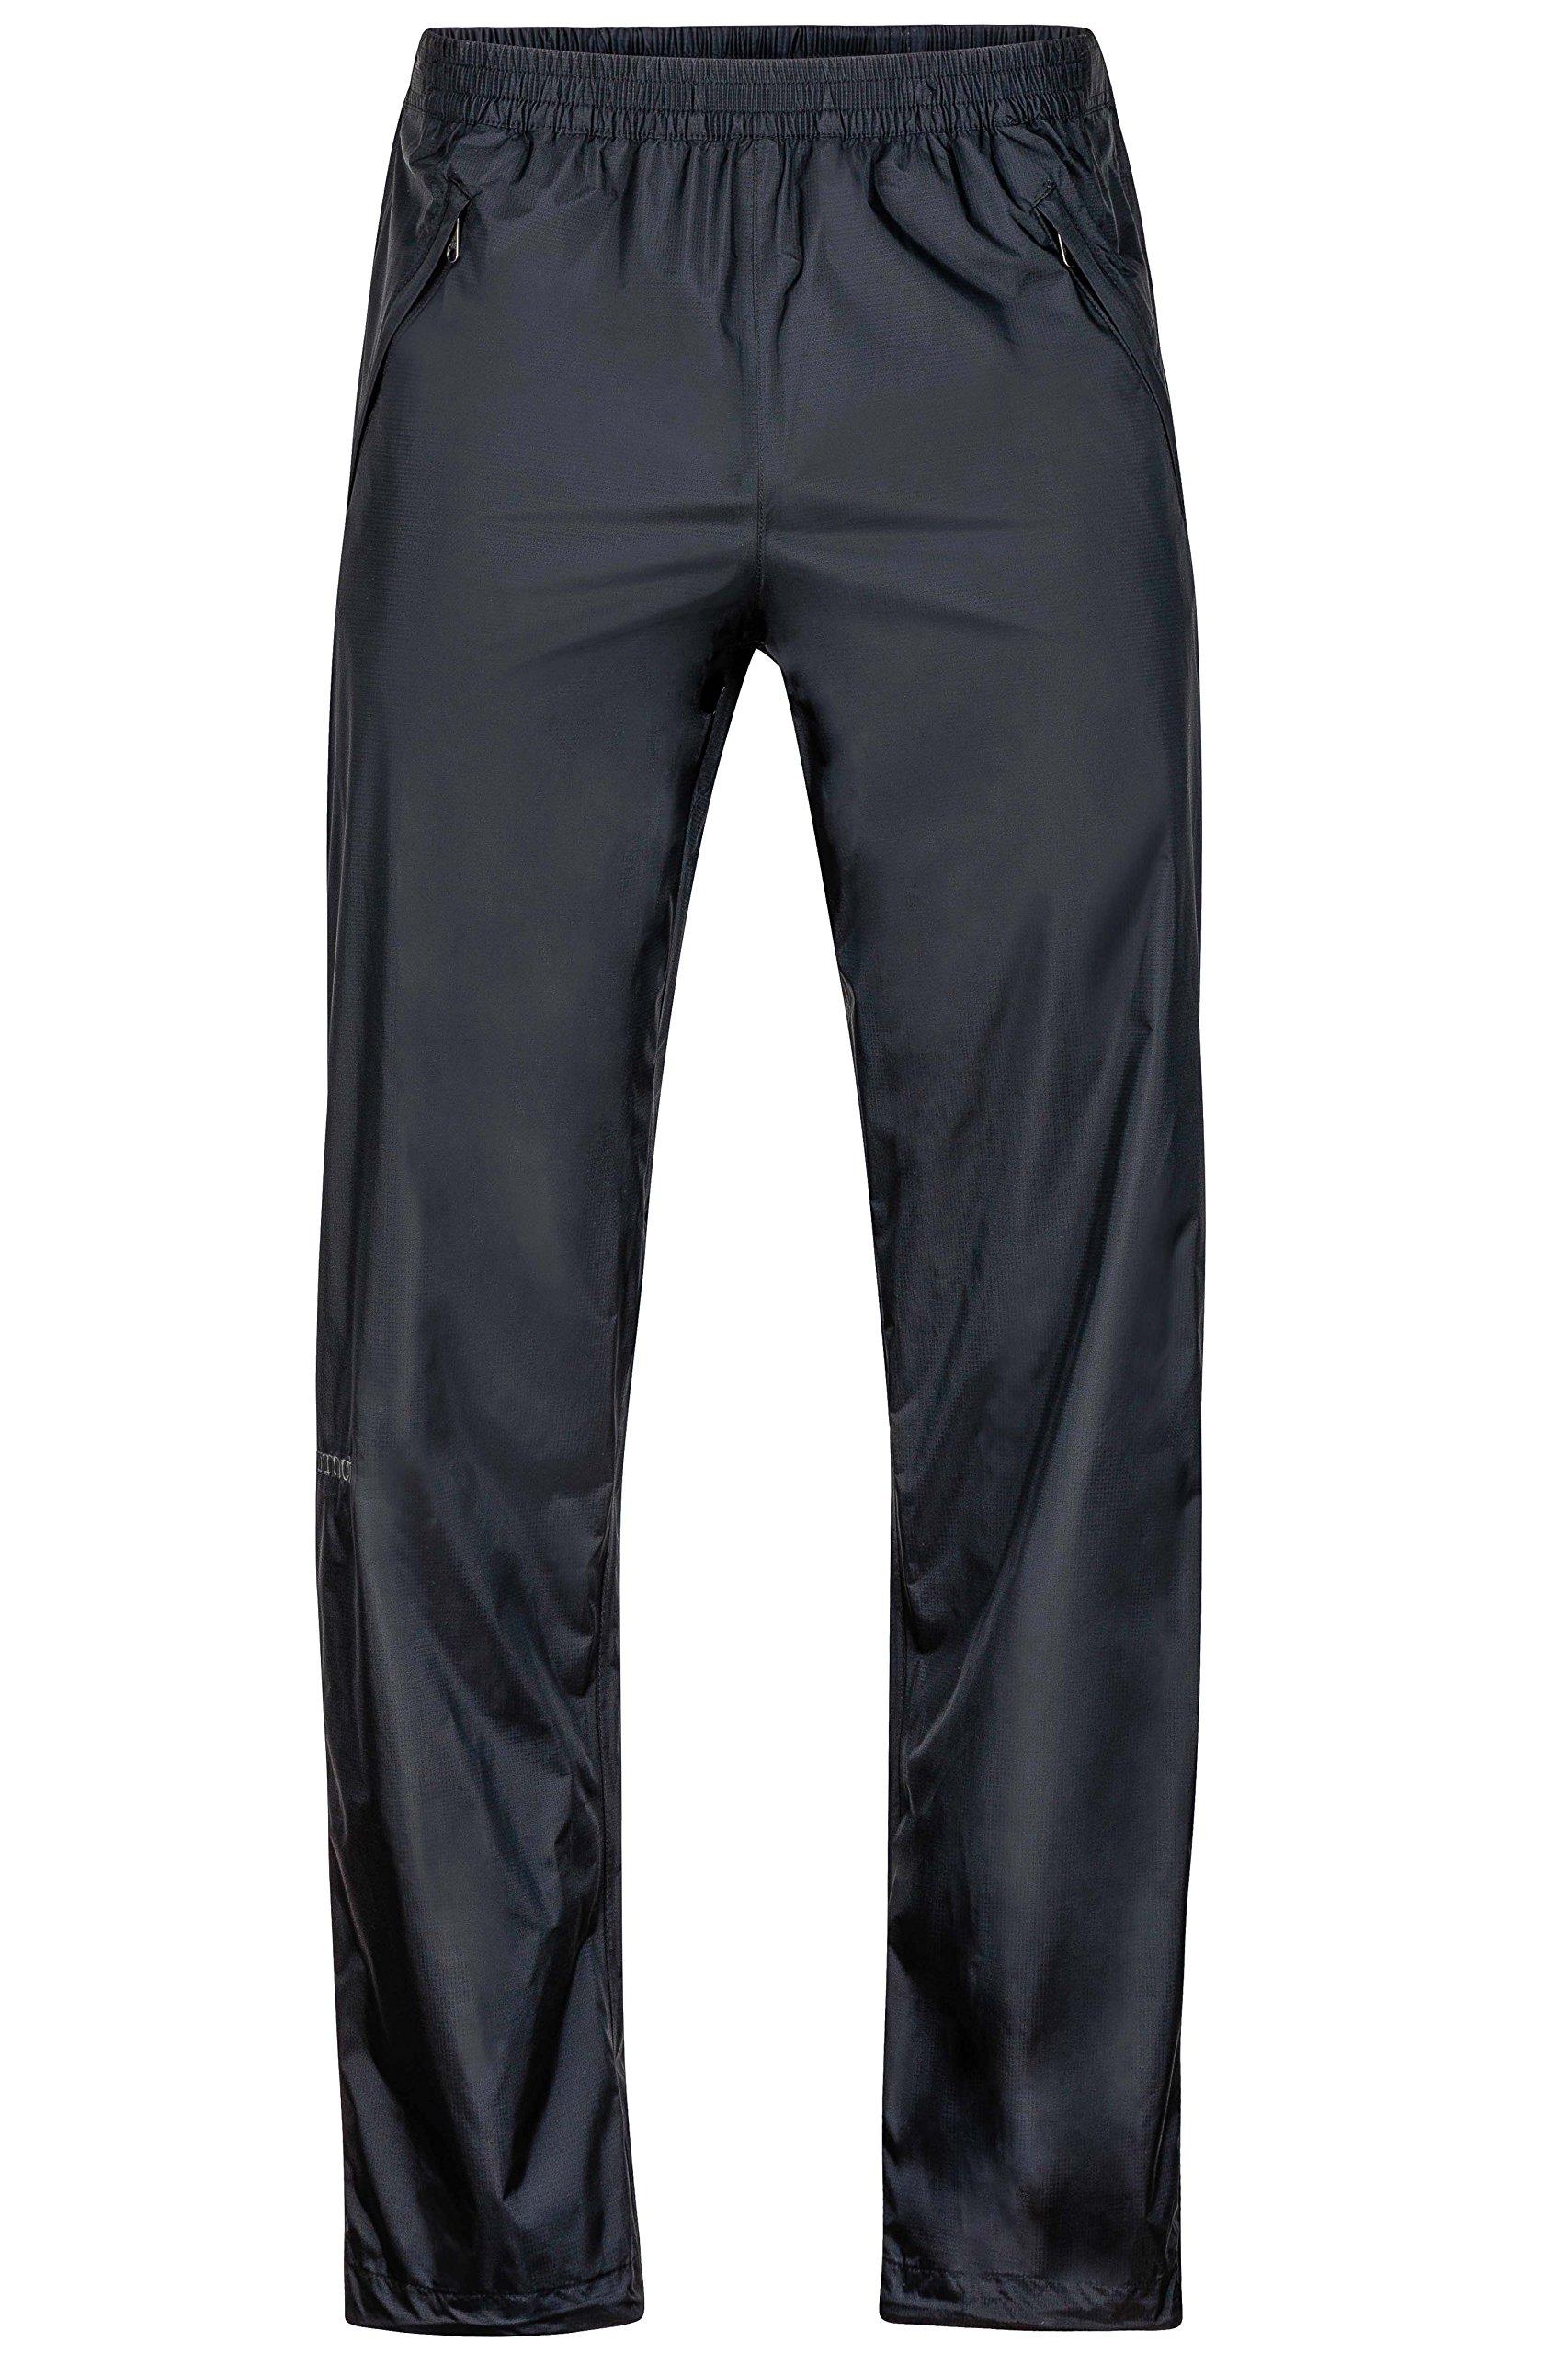 Marmot PreCip Men's Lightweight Waterproof Full-Zip Pant, Small, Jet Black by Marmot